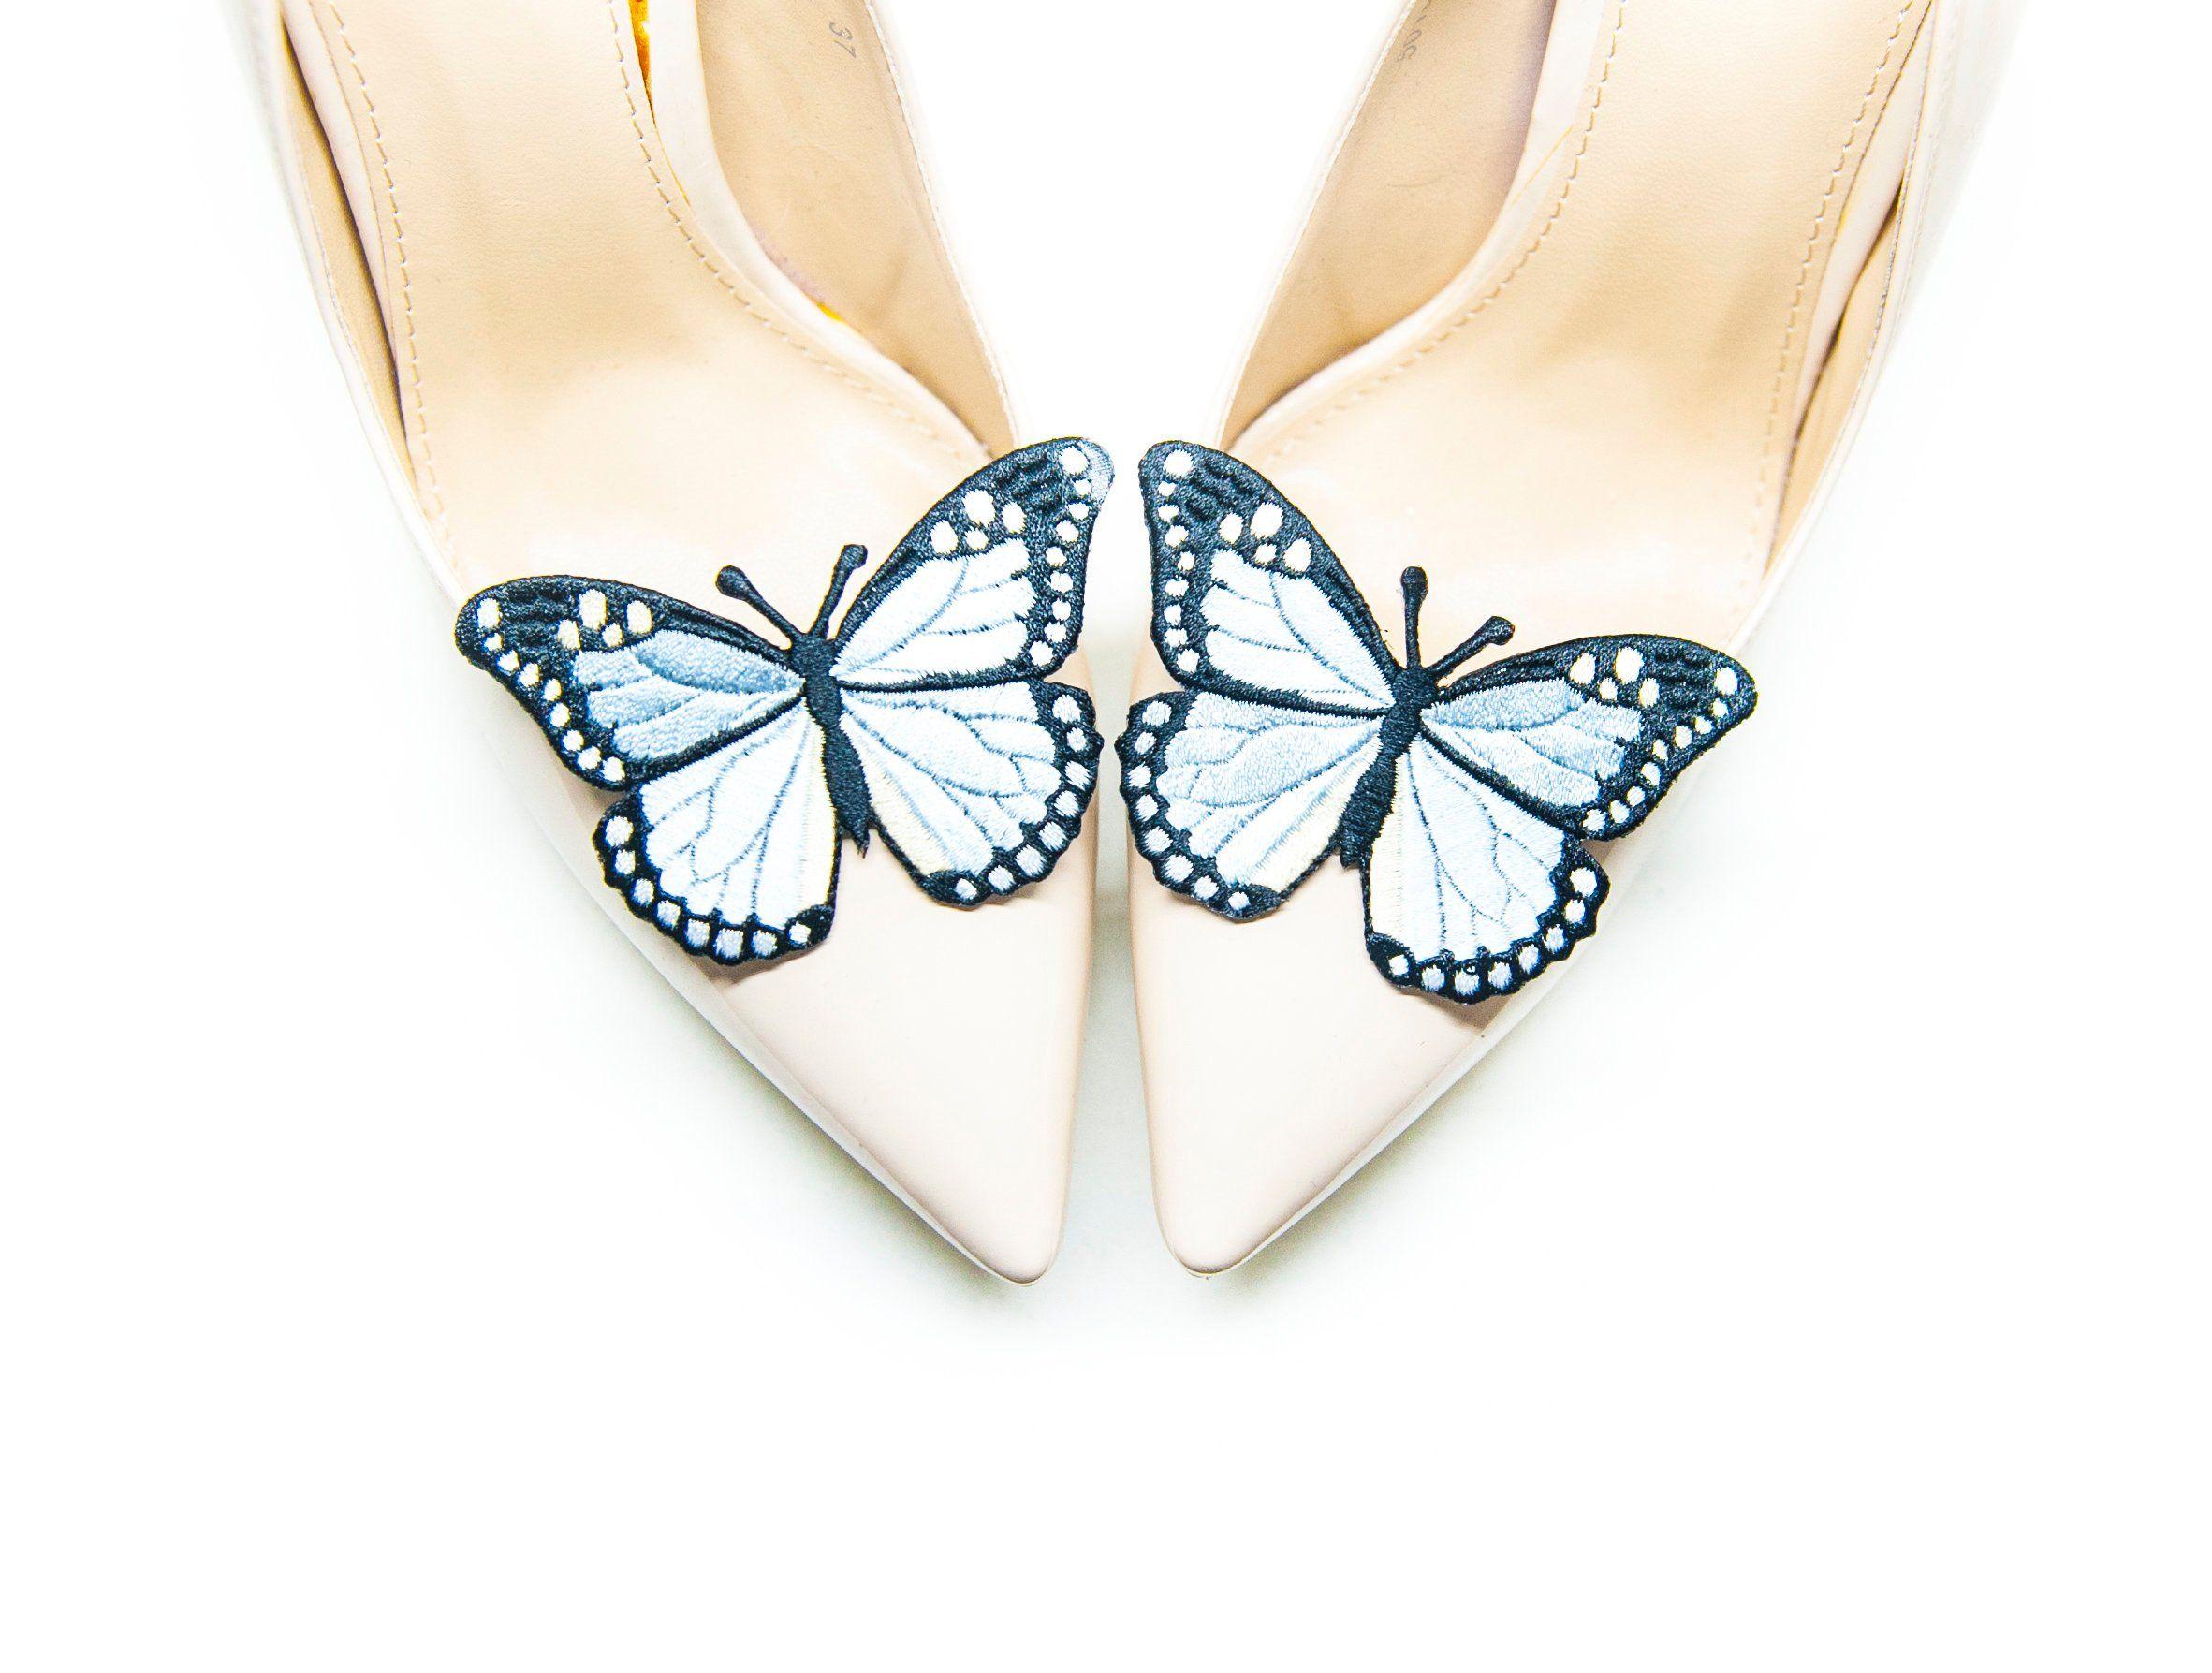 Blekitne Motyle Klipsy Spinki Do Butow Mififi Shoe Clips Mule Shoe Shoes